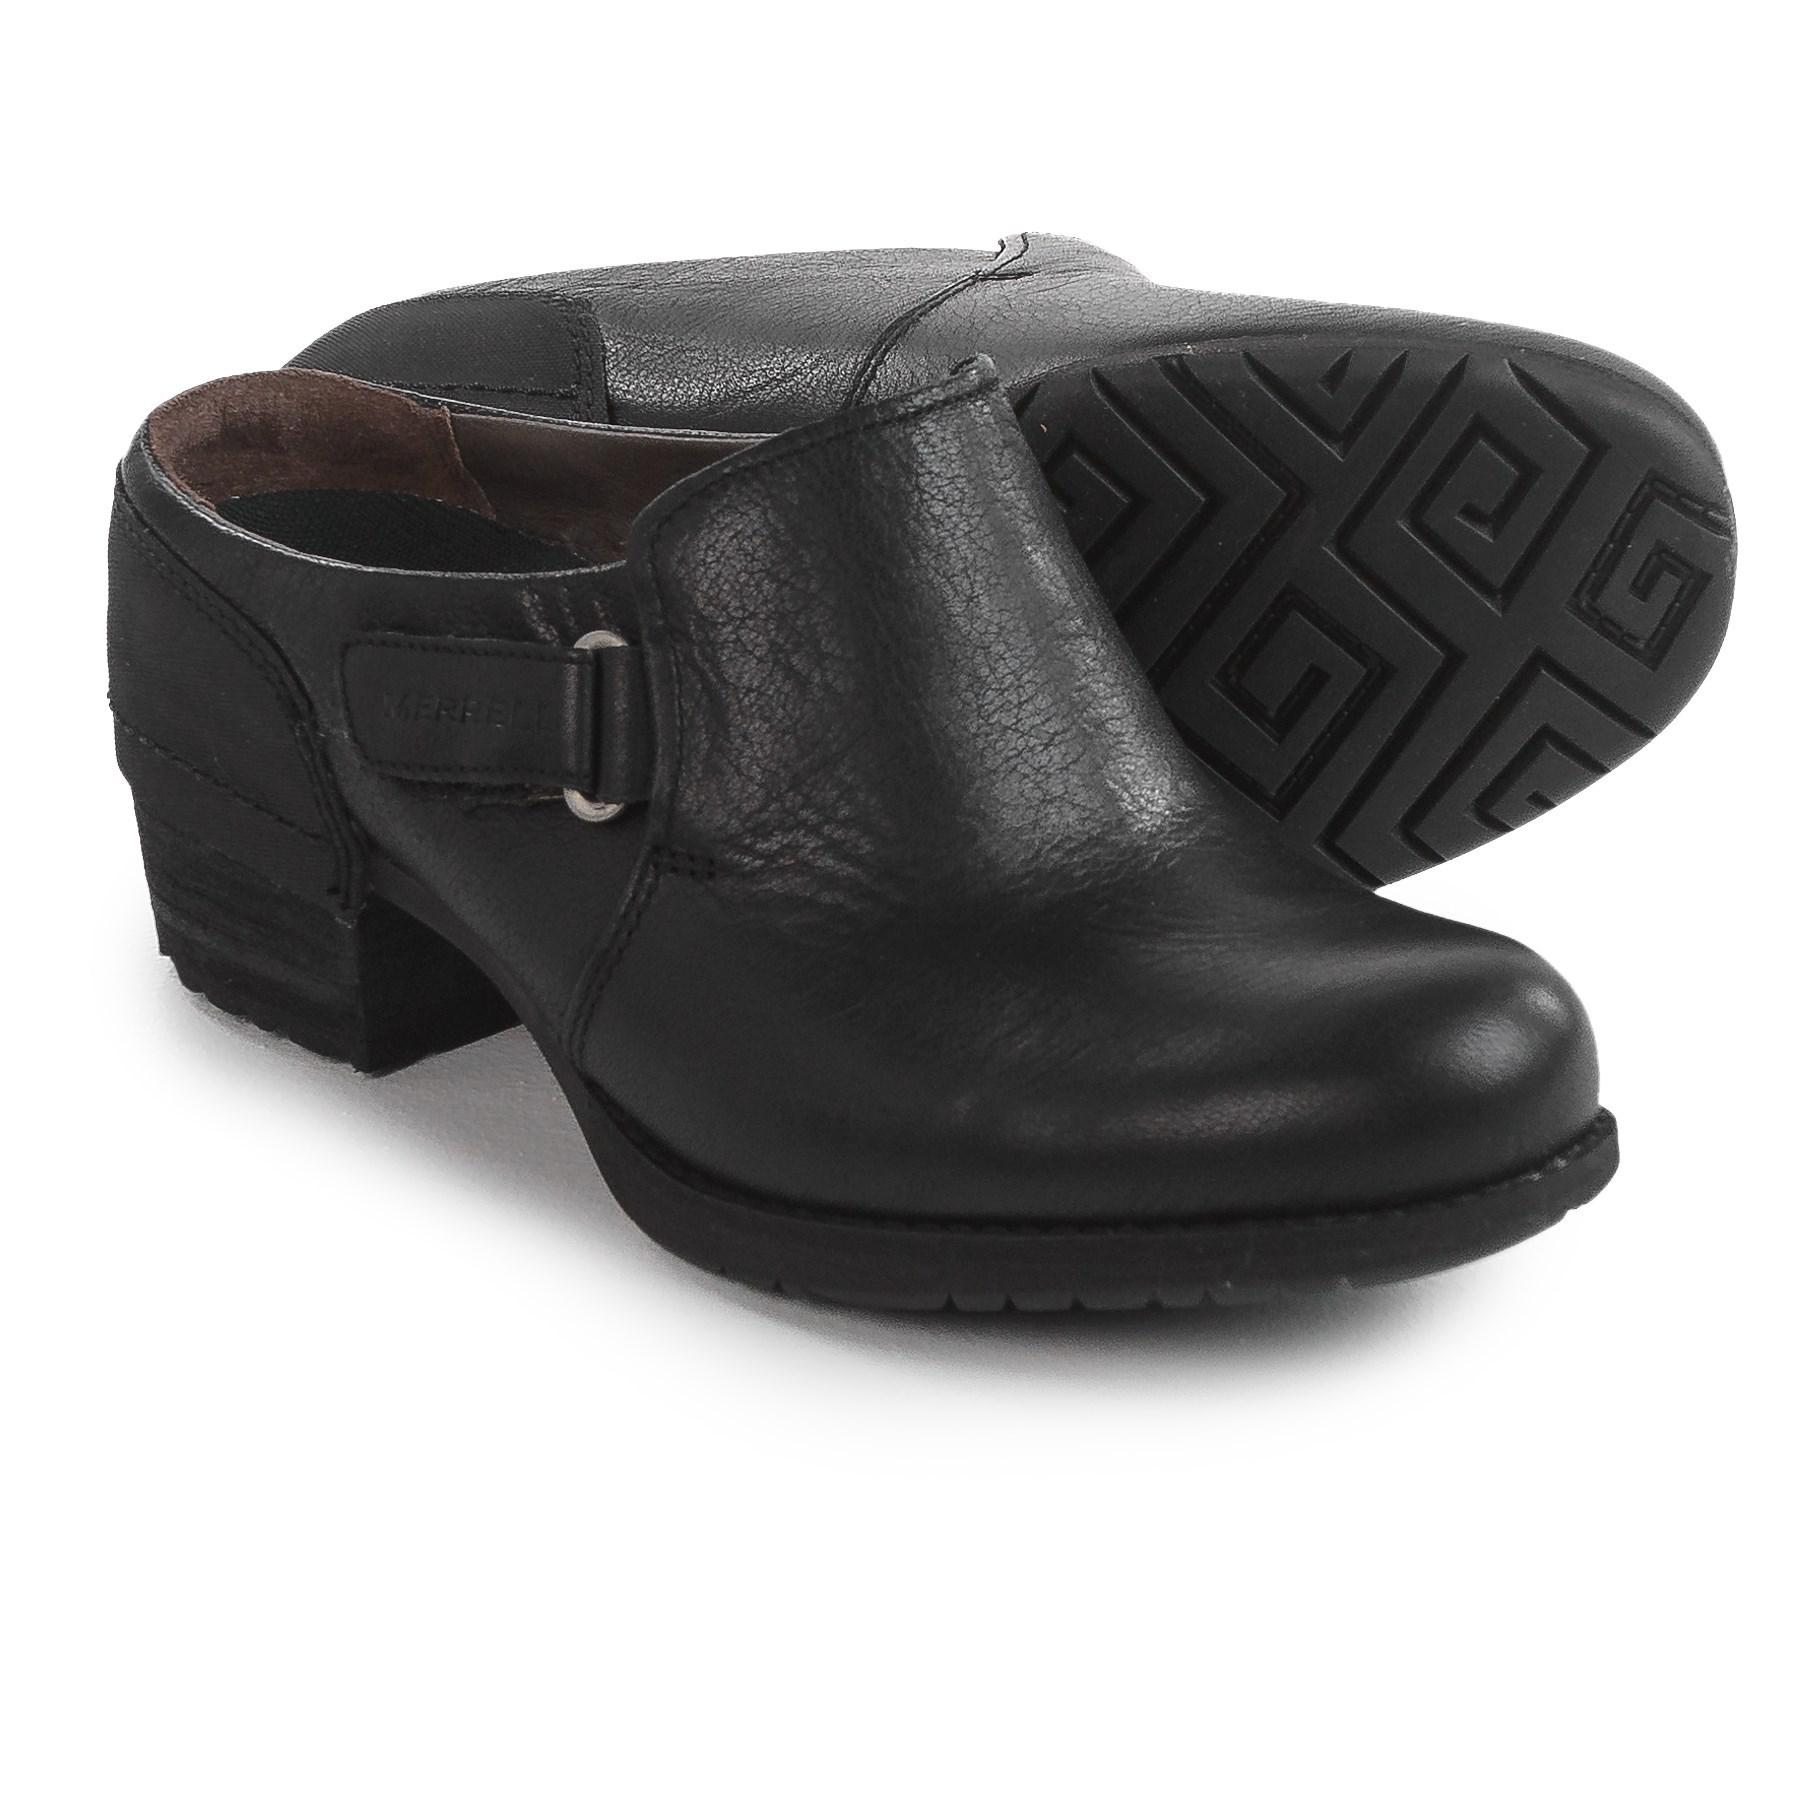 d2bd8c15 Merrell - Black Shiloh Slip-on Clogs - Lyst